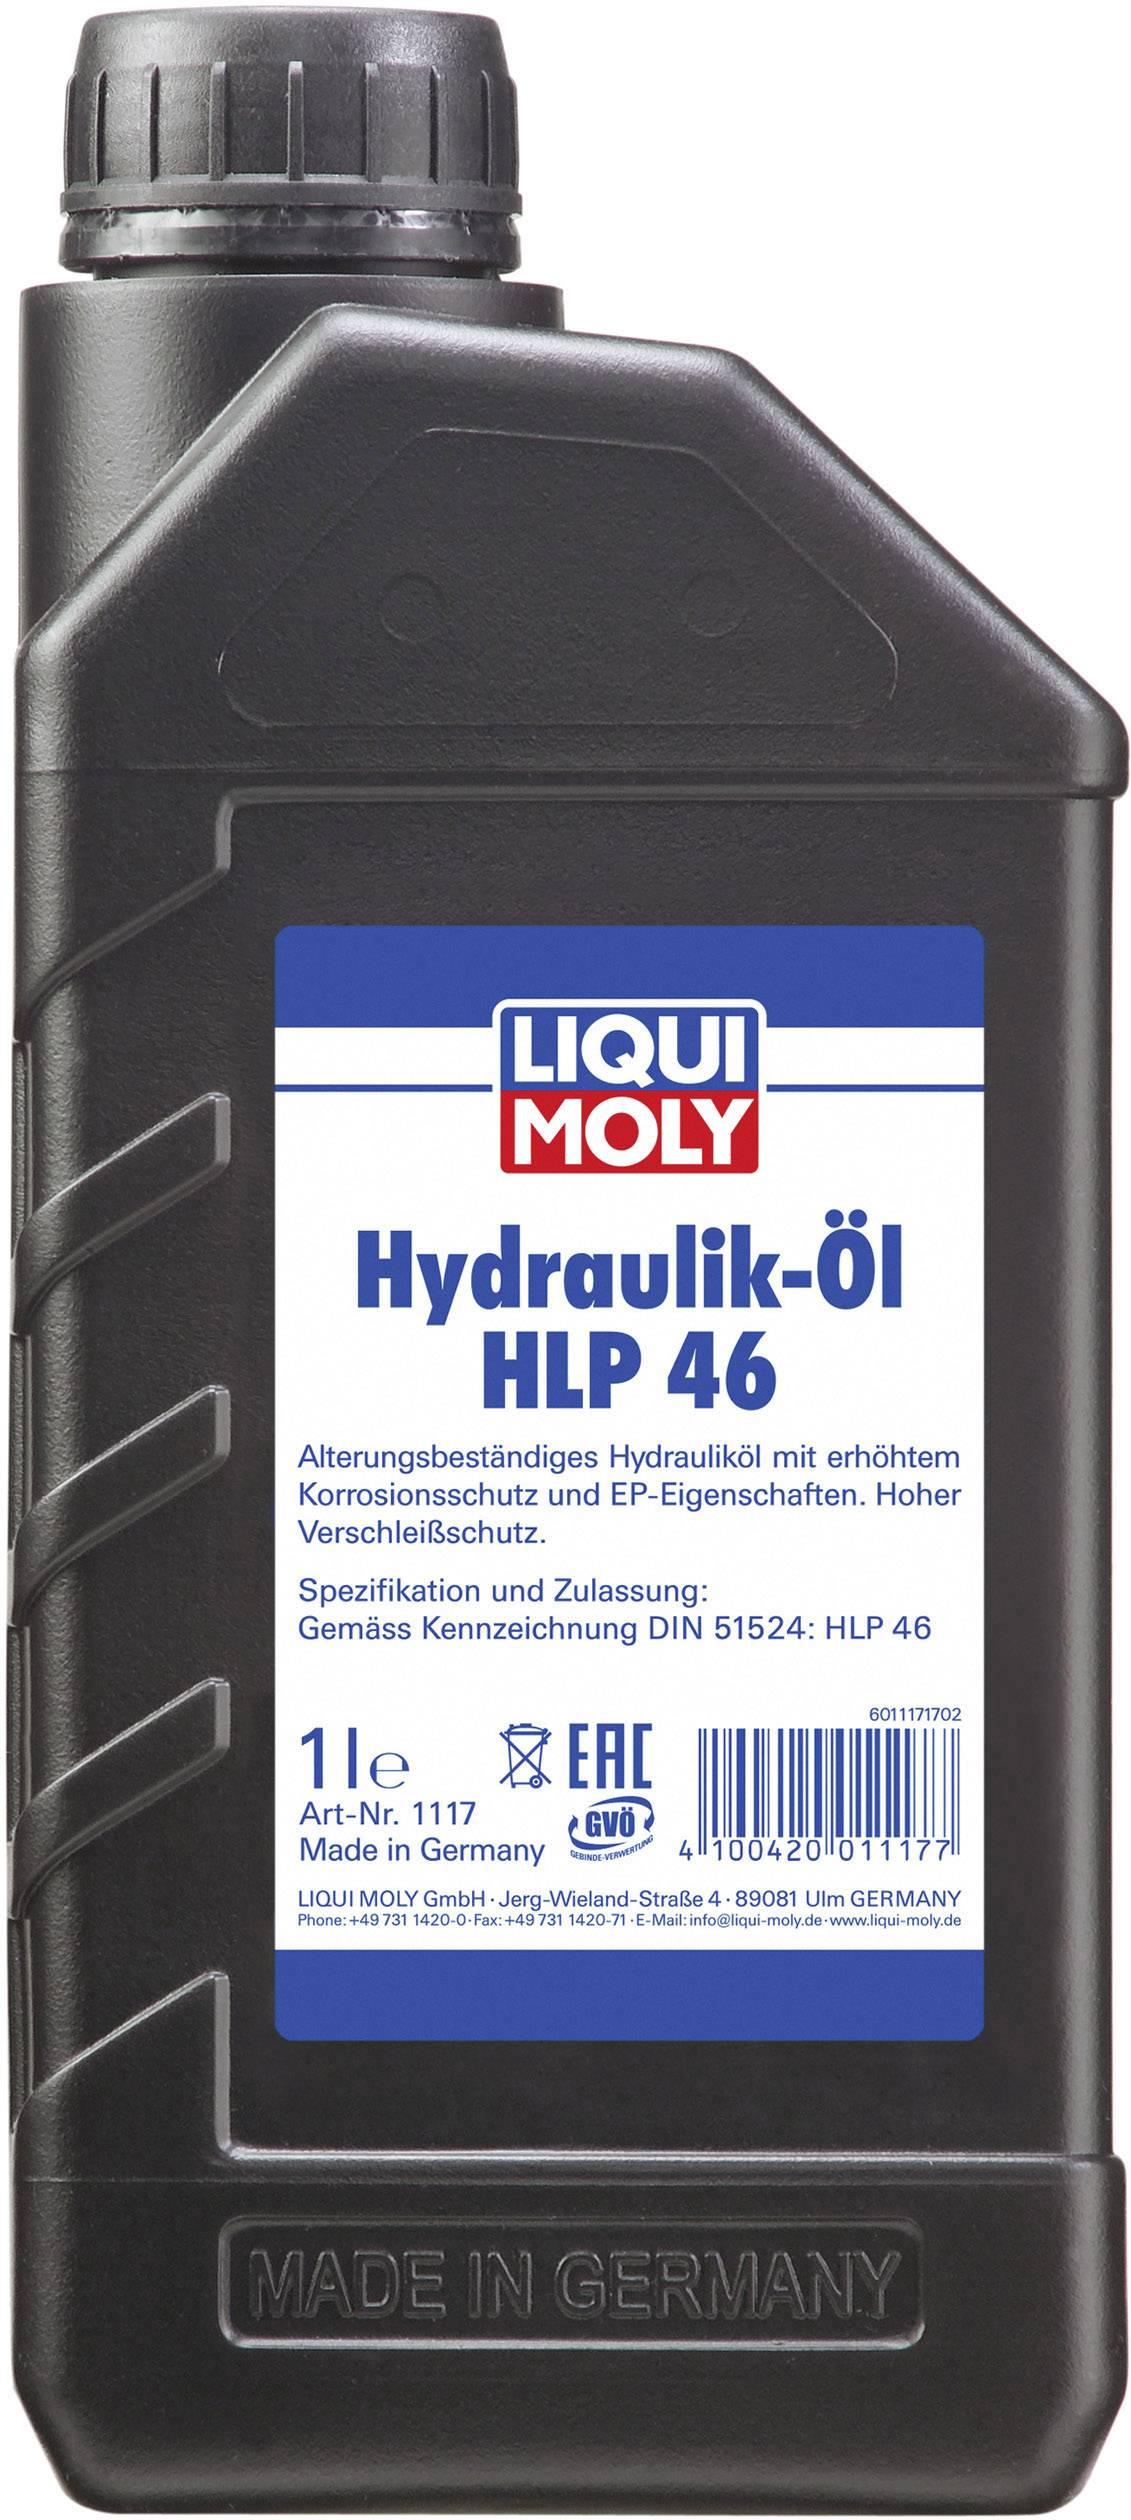 9,46 €//1 L stoßdämpferöl 1 L Liqui Moly 20960